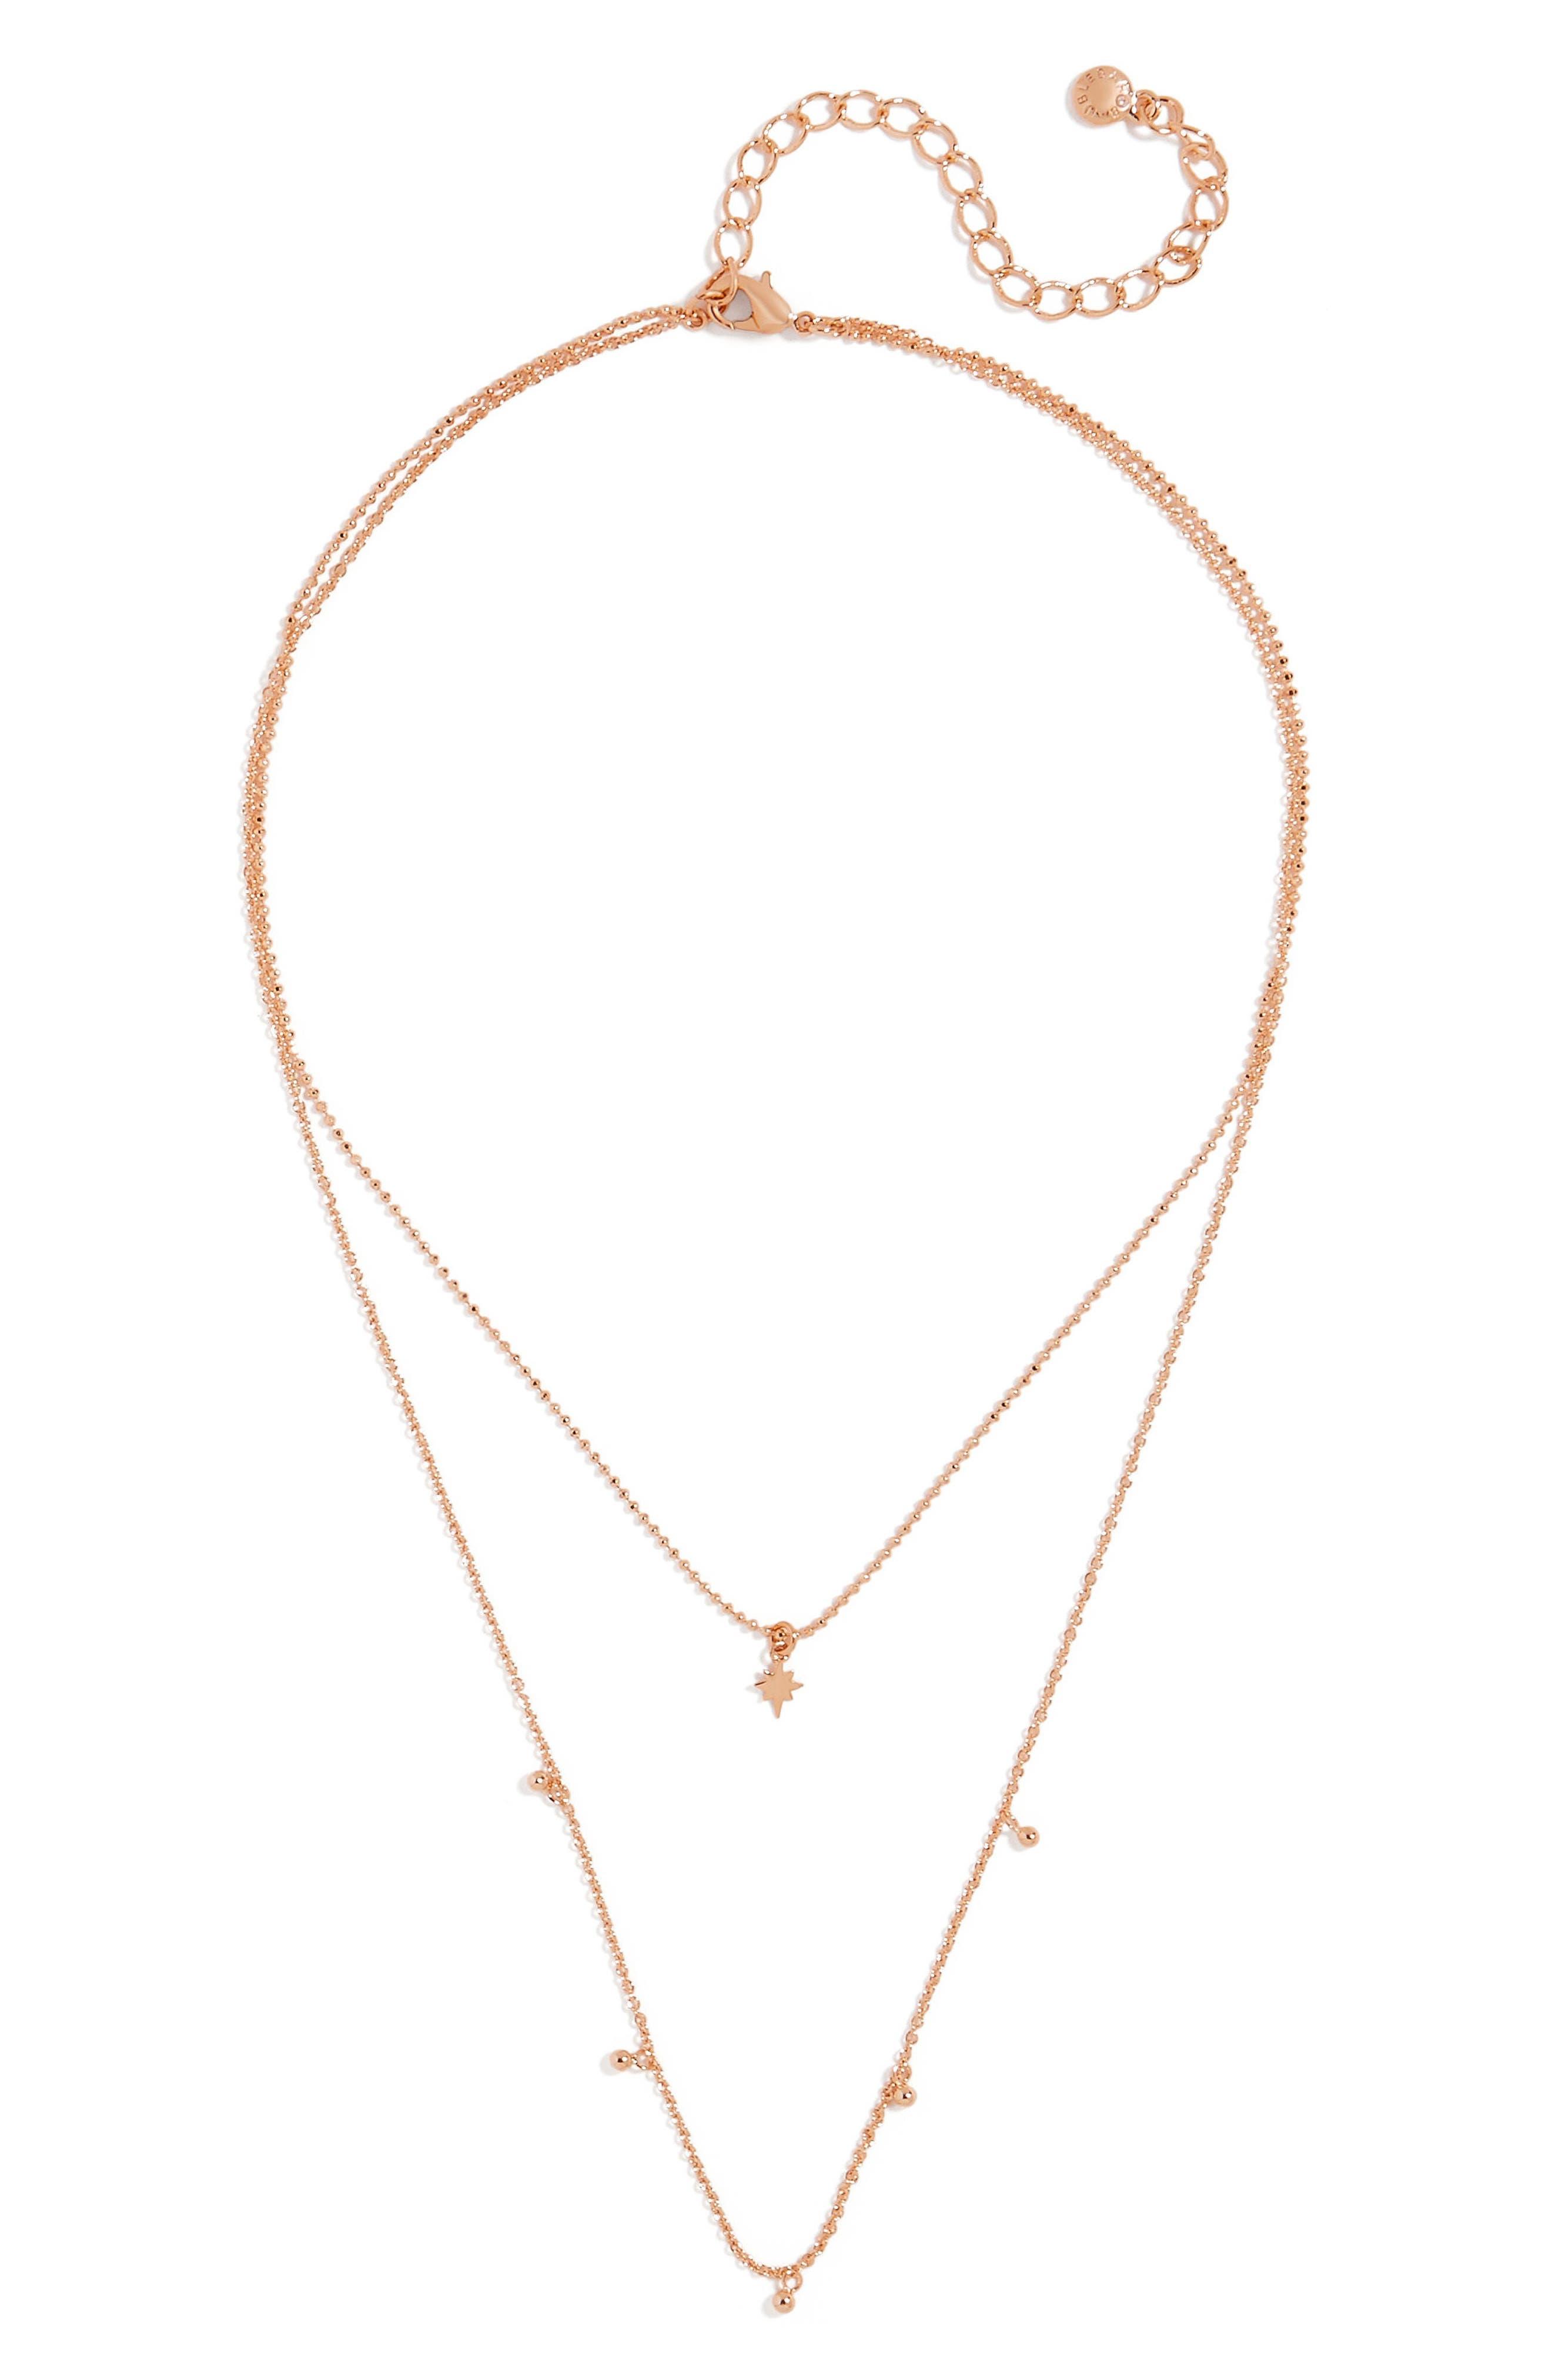 Main Image - BaubleBar Multistrand Necklace